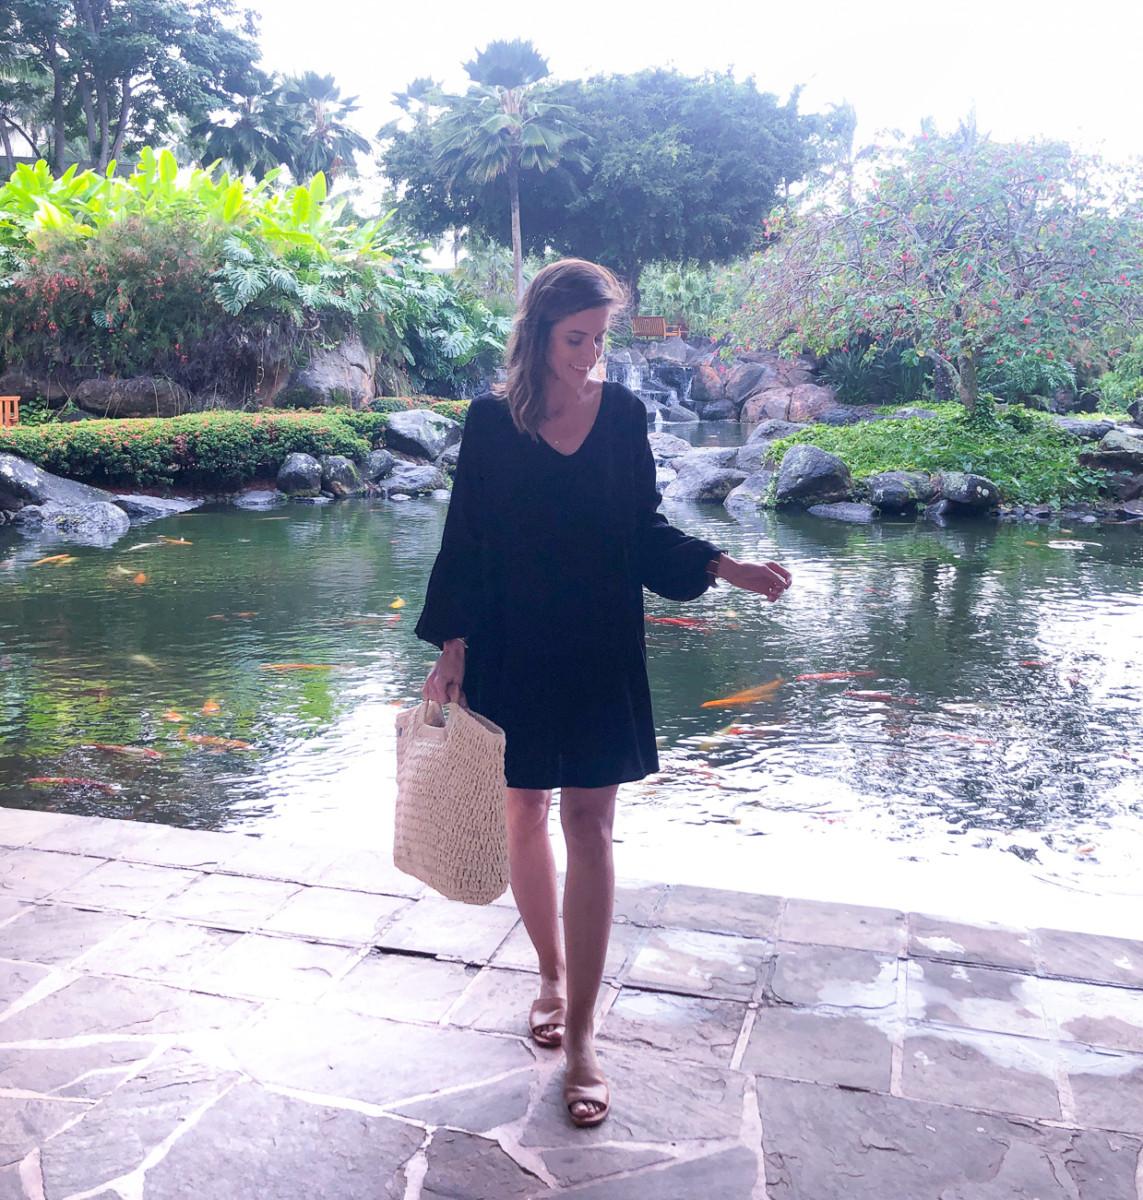 Best Things to Do In Kauai Hawaii | Honeymoon in Kauai | Cobalt Chronicles | Travel Blogger